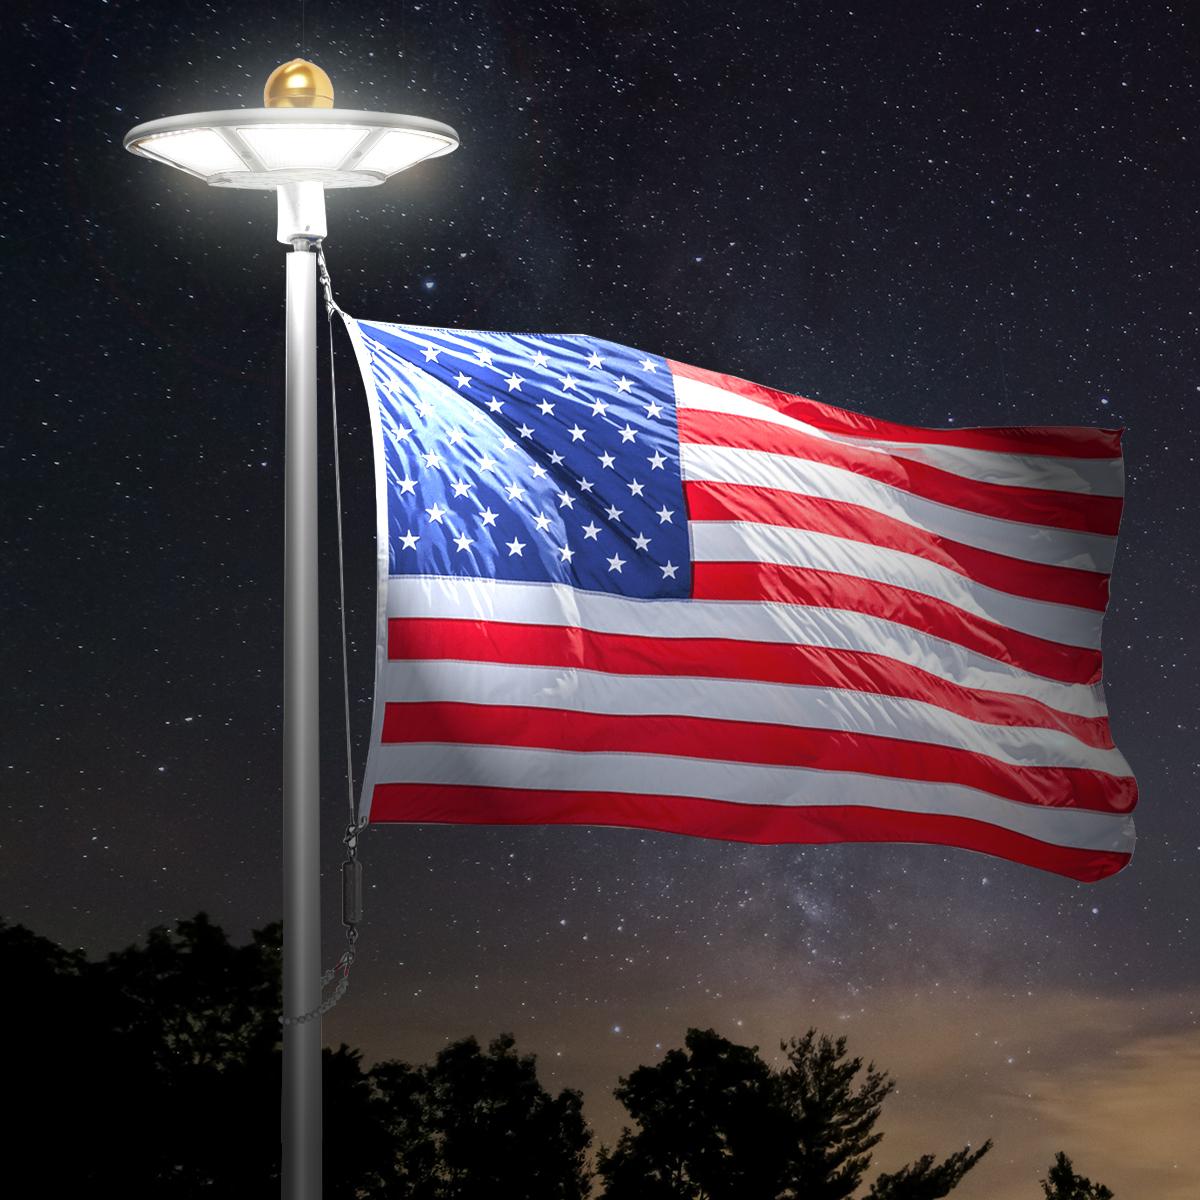 Auto On//Off Night Lighting Top Flagpole Mount 128 led Lights Super Bright Flag Pole LED Solar Powered Flagpole Lights Solar Flag Pole Light Longest Lasting Upto 10 Hrs Waterproof Energy Saving